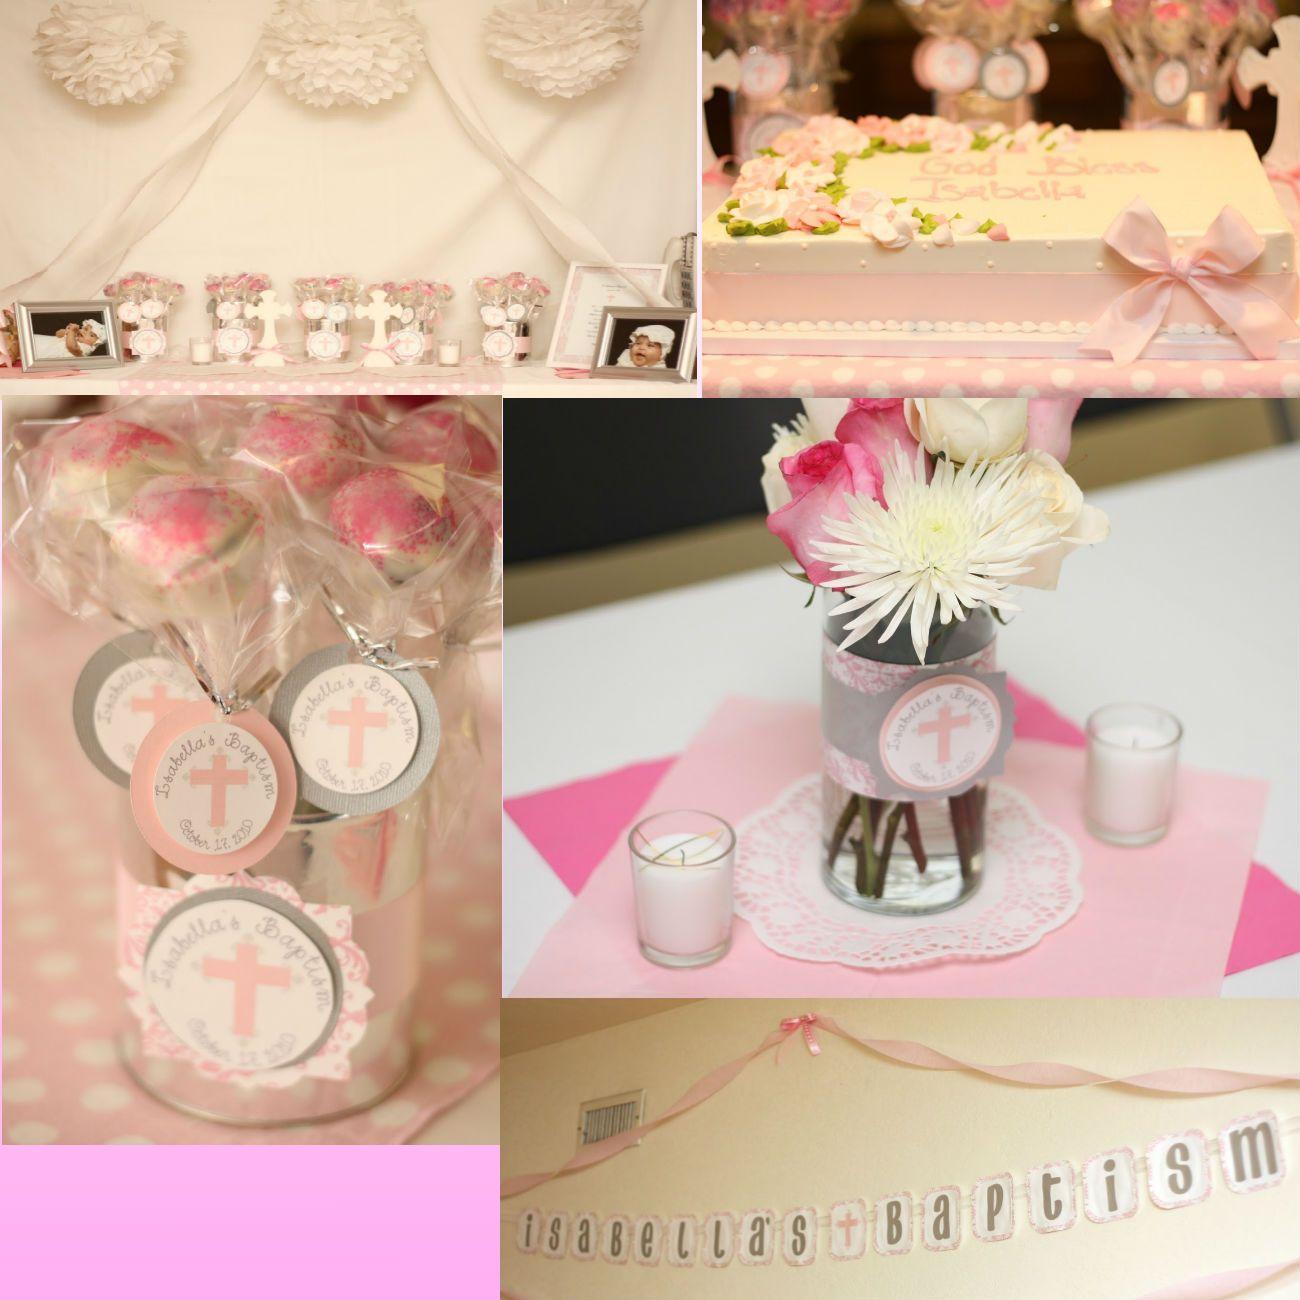 More baptism decorations ideas - Angel themed & Baptism Decor Cake Favors and Centerpiece | Baptism | Pinterest ...